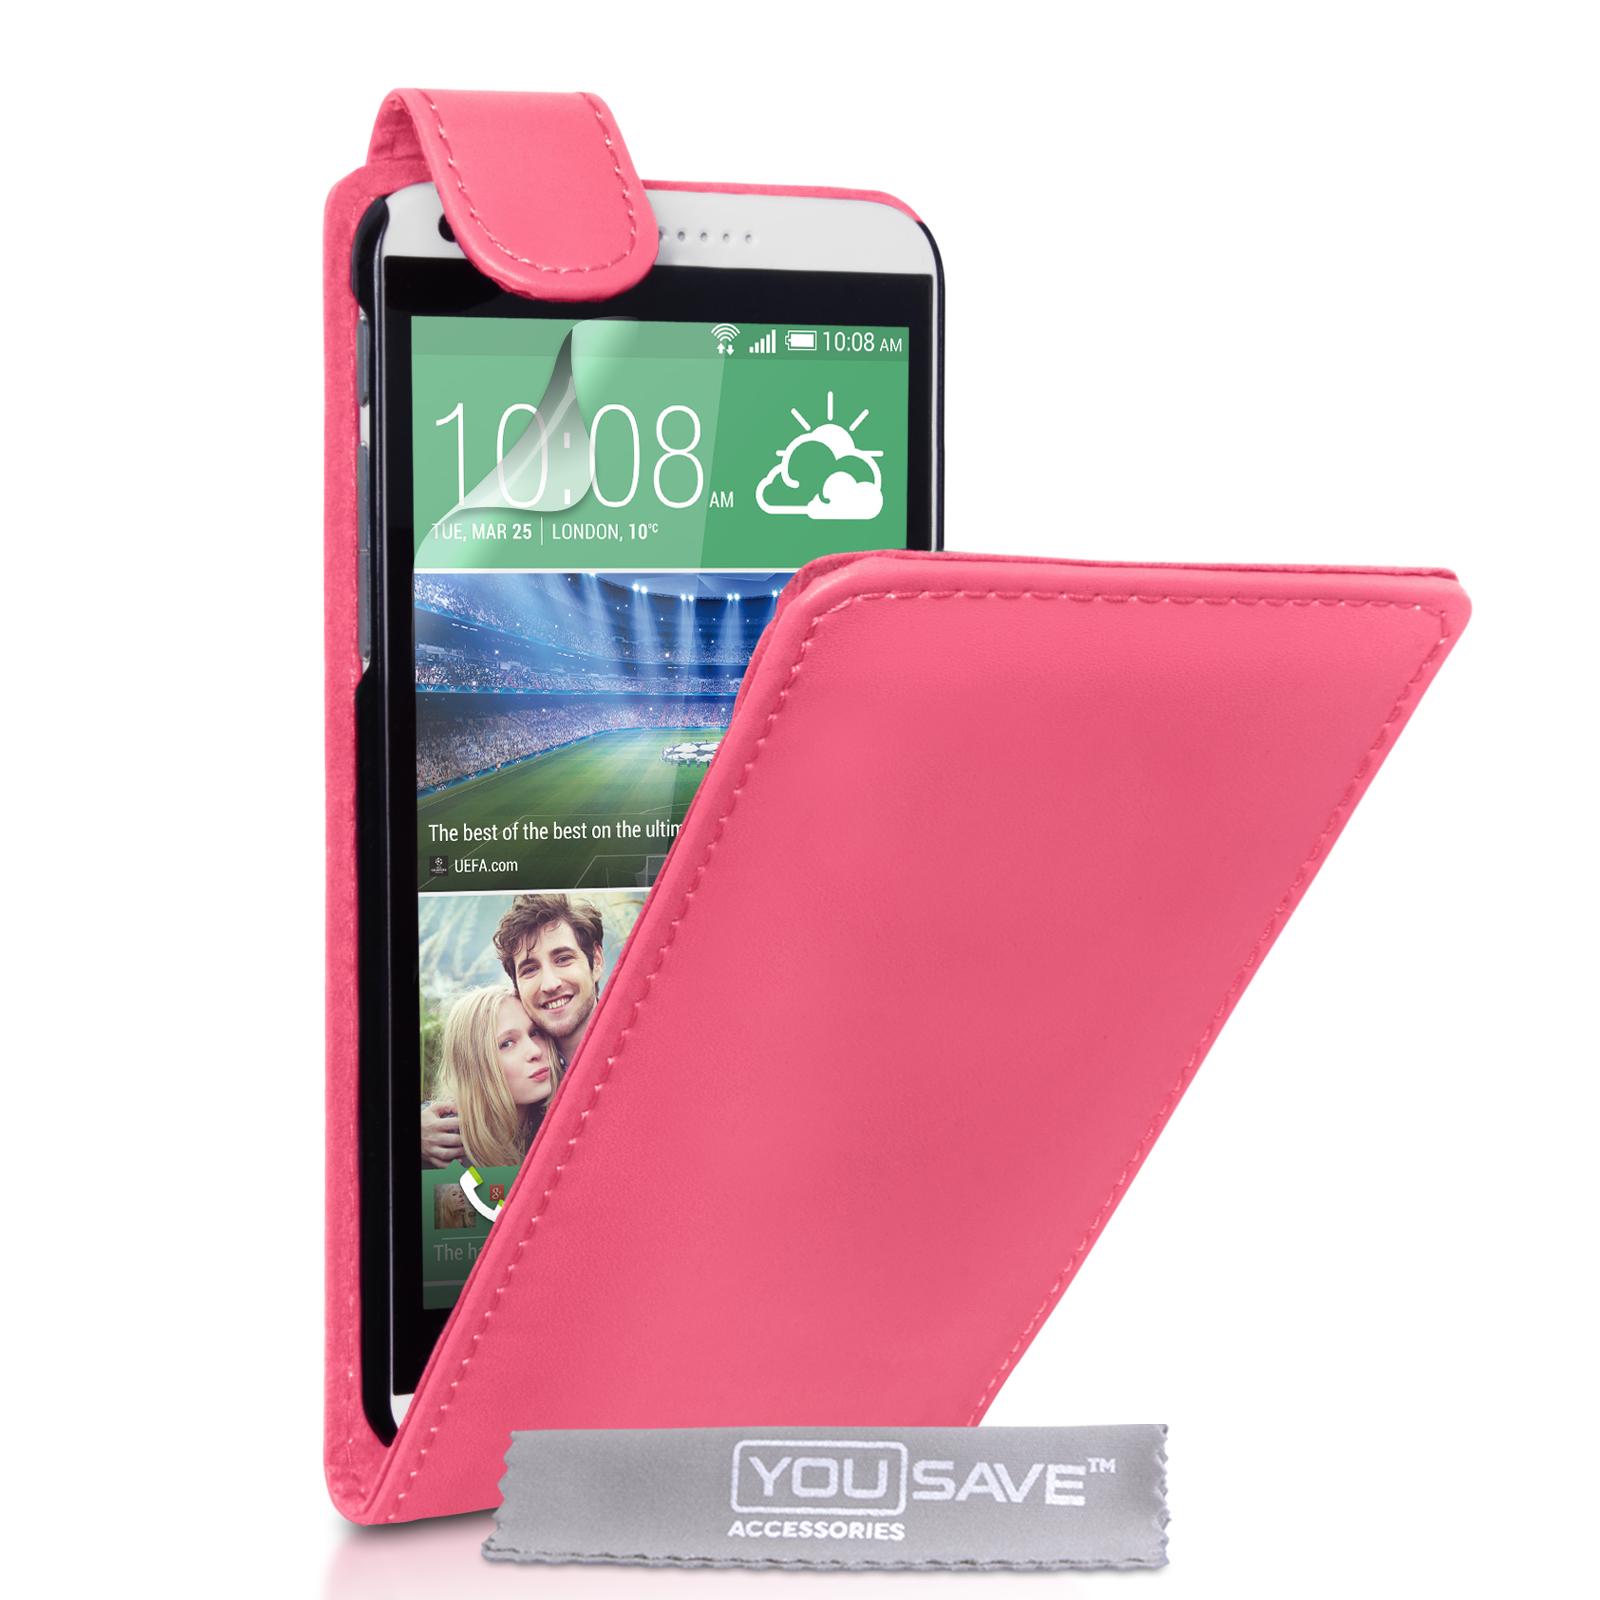 Flip Θήκη HTC Desire 816 by YouSave (Z406)